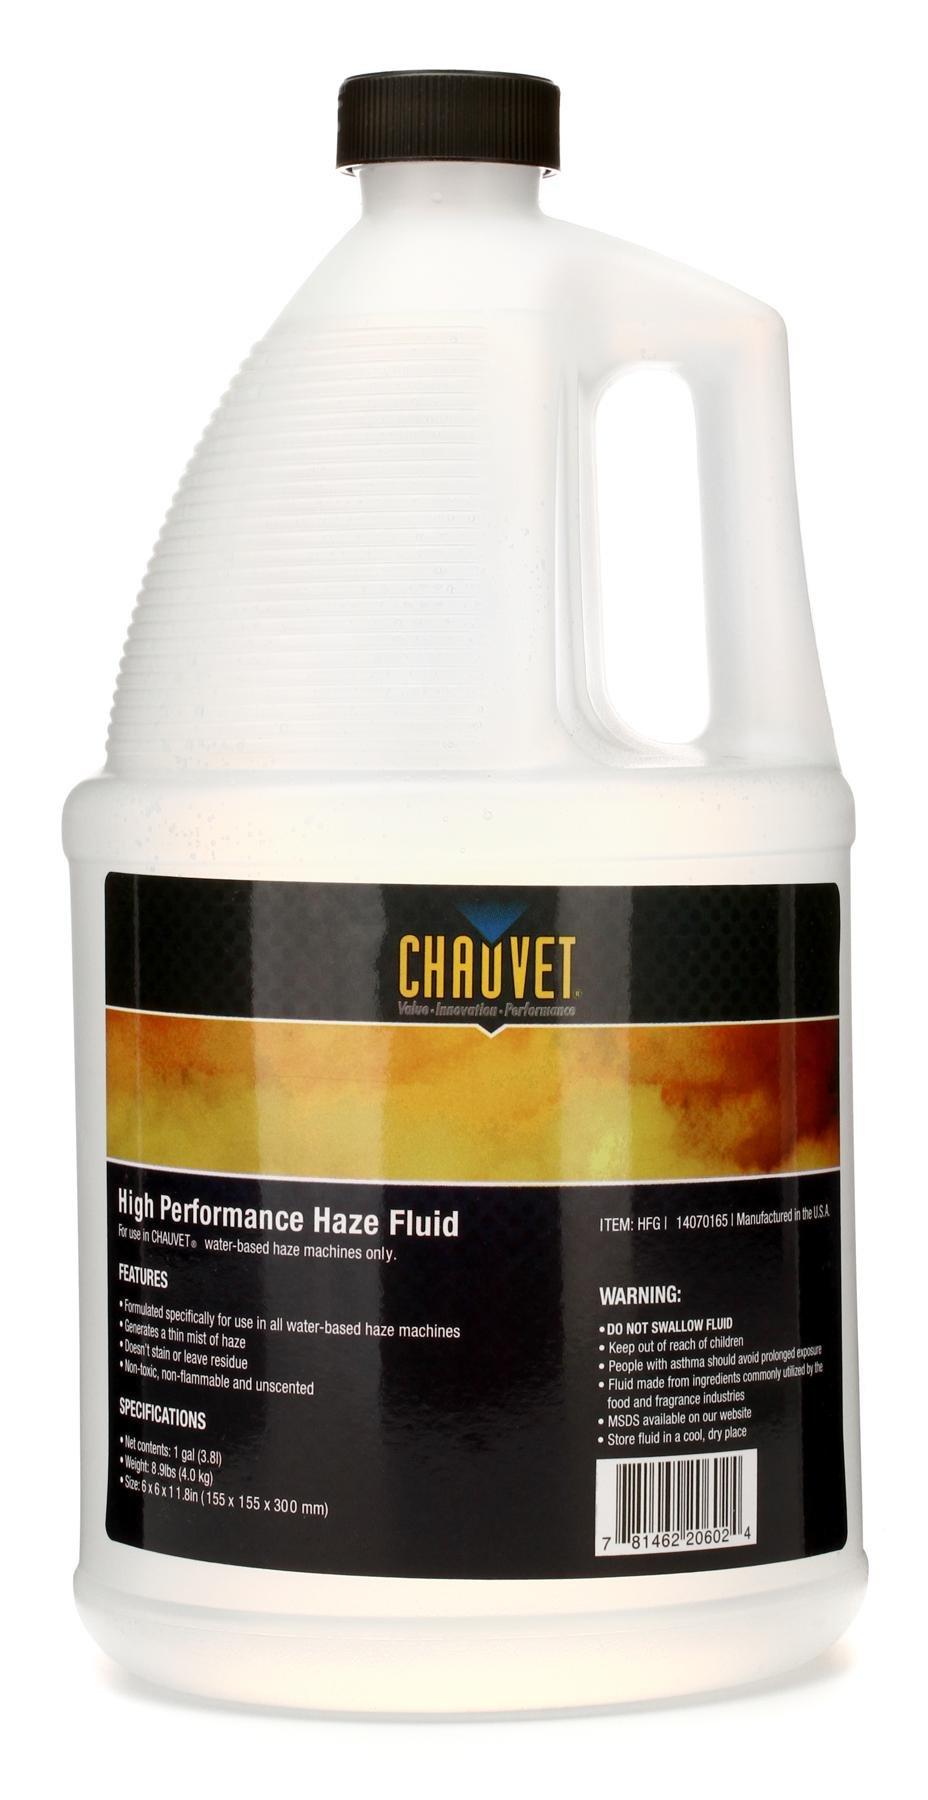 Chauvet Performance Haze Fluid 1 Gallon